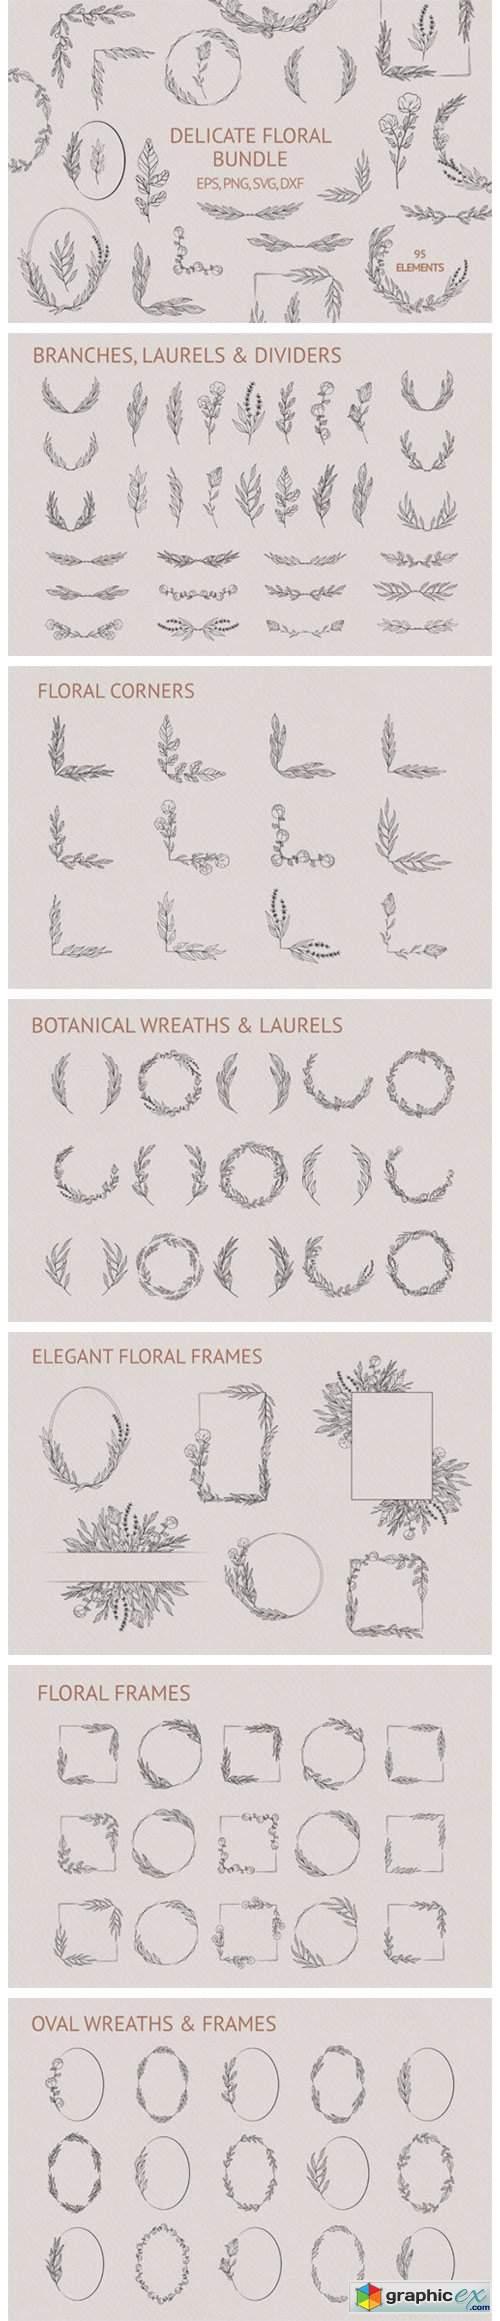 Hand Drawn Delicate Floral Bundle